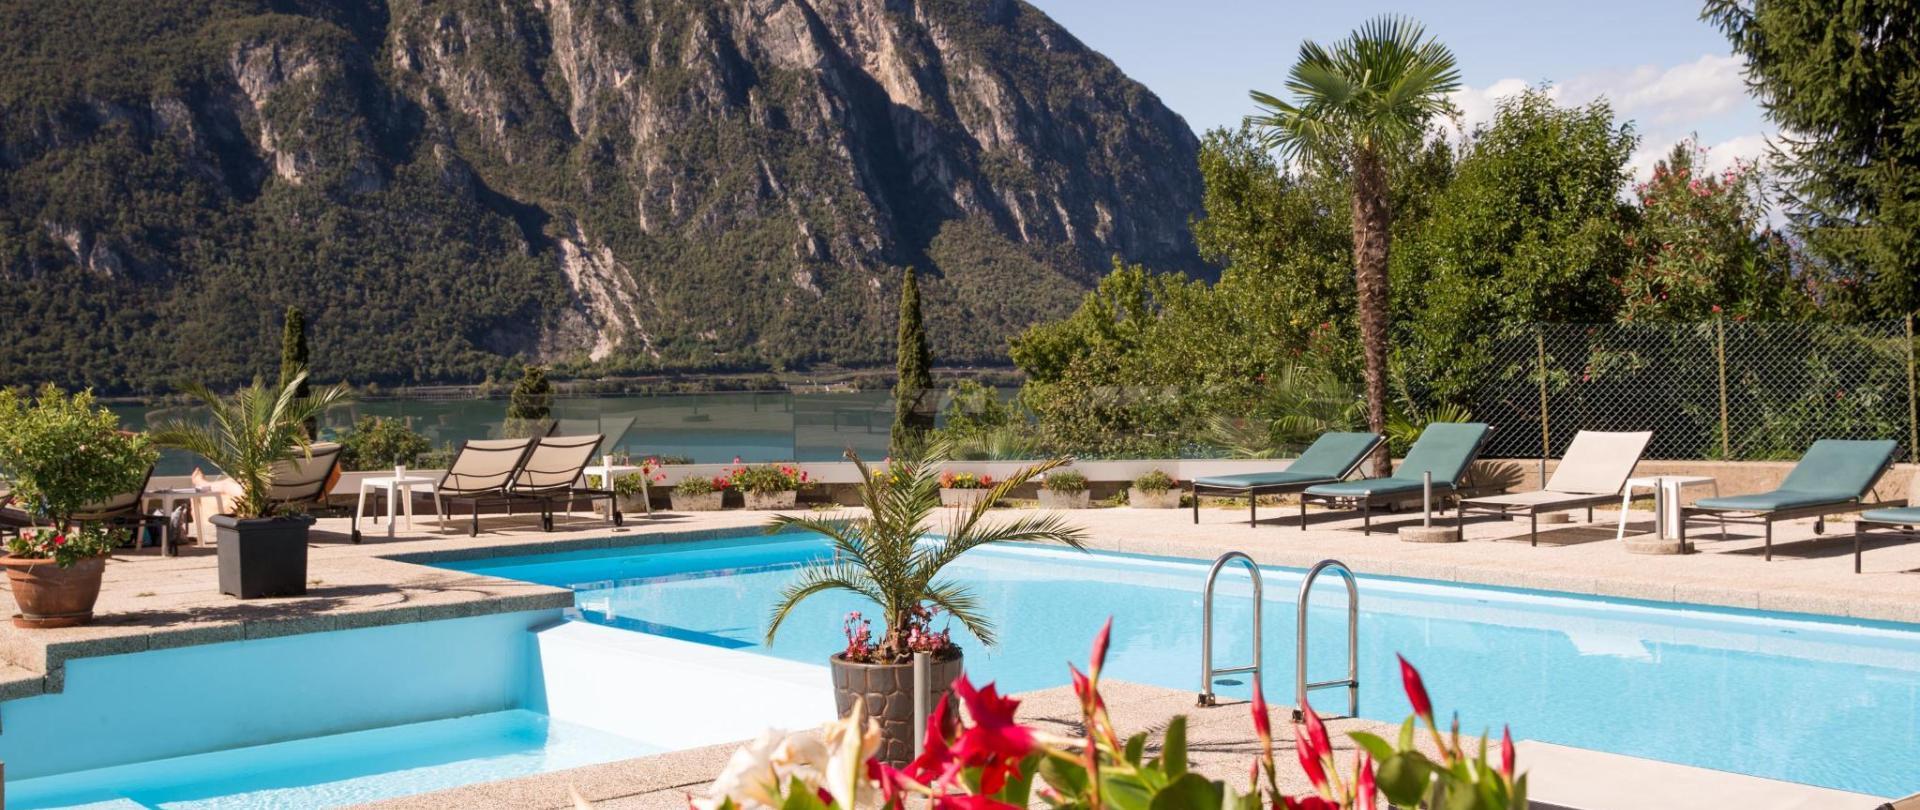 hotel-campione-bissone-piscina2.jpg